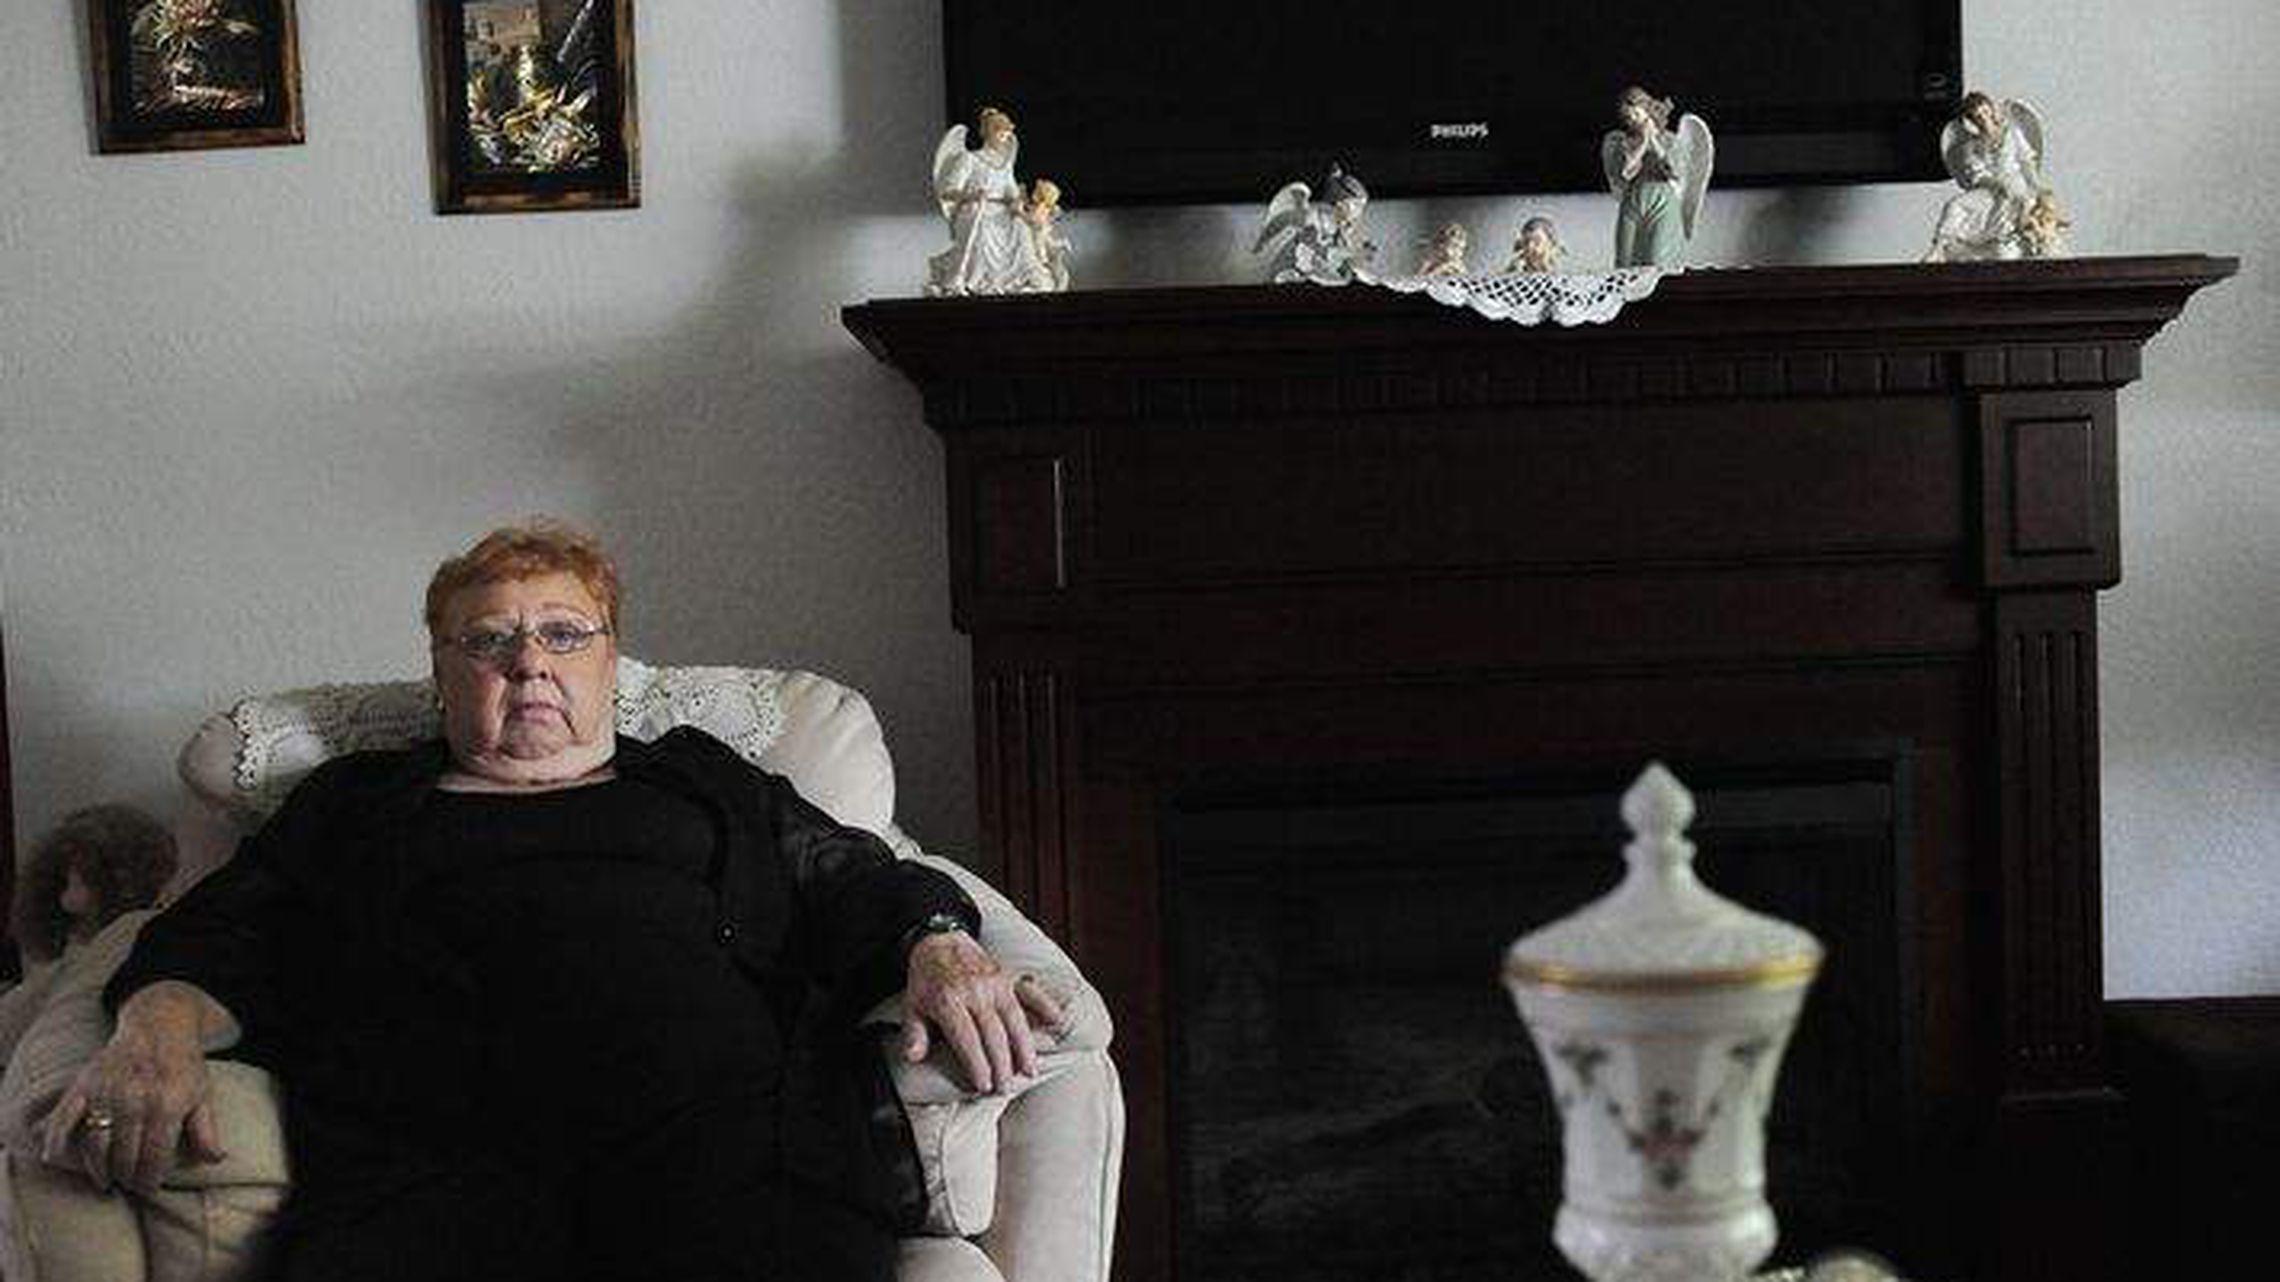 Black Friday Ruckus Firing Changes 73 Year Old Walmart Greeter S Life